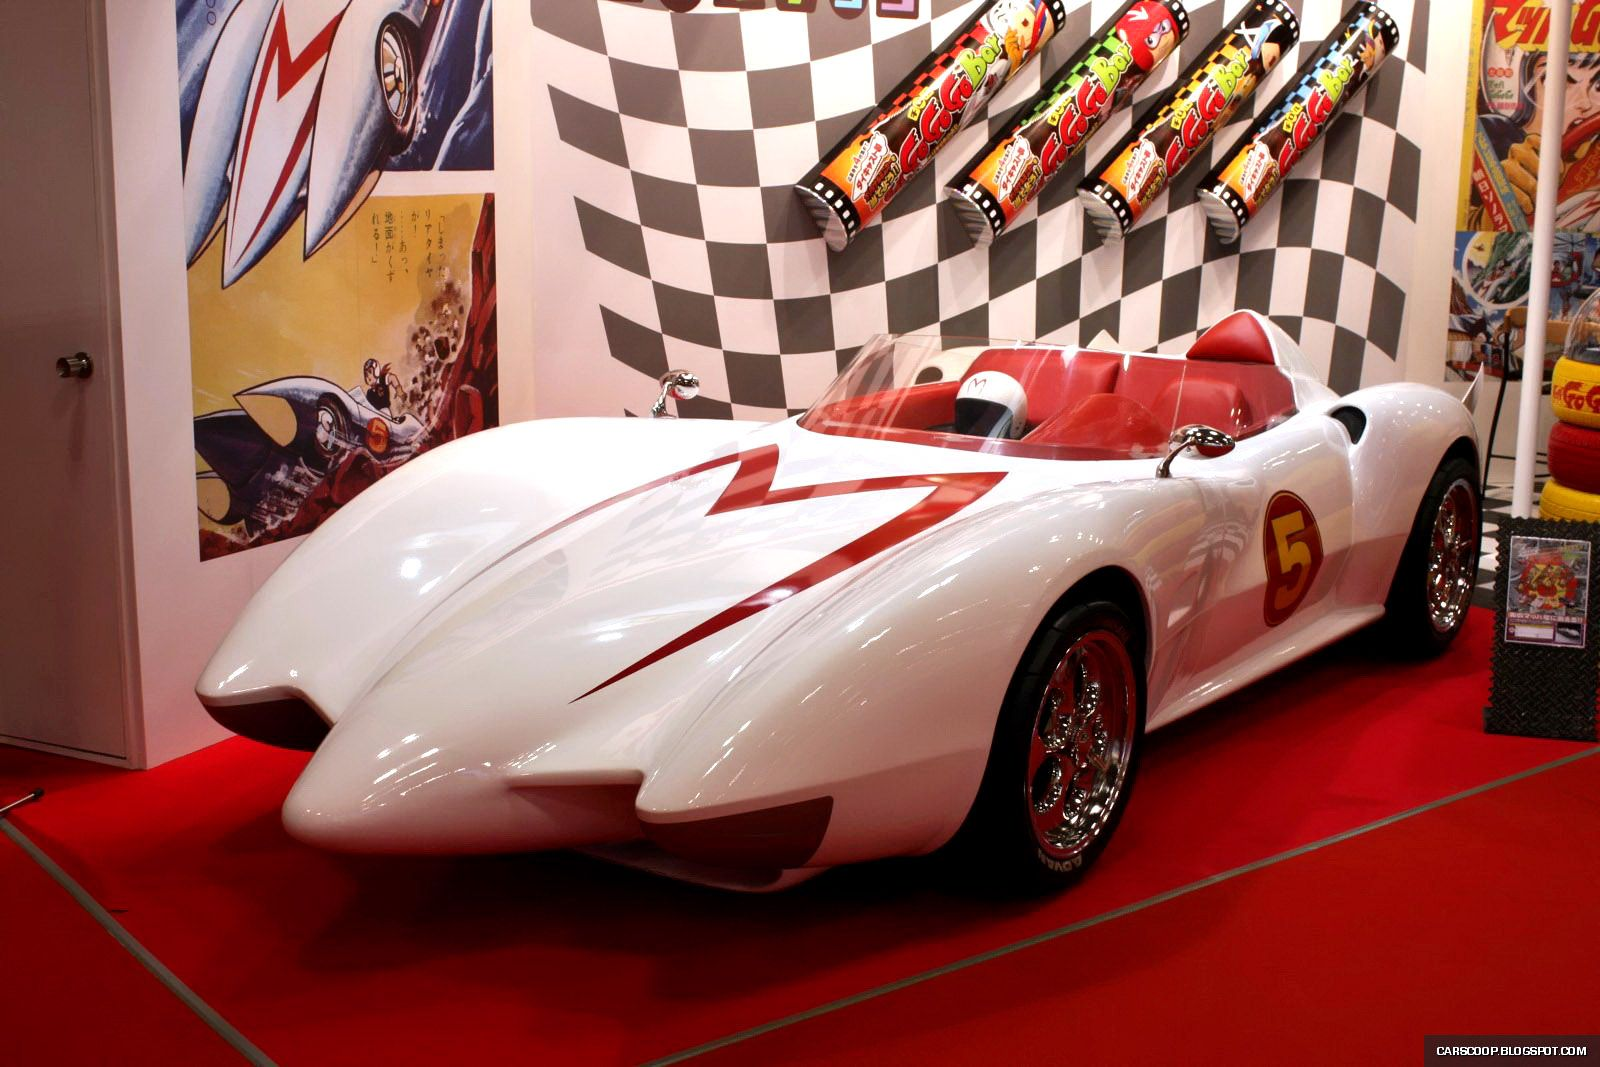 Speed racer mach 5 cartoon